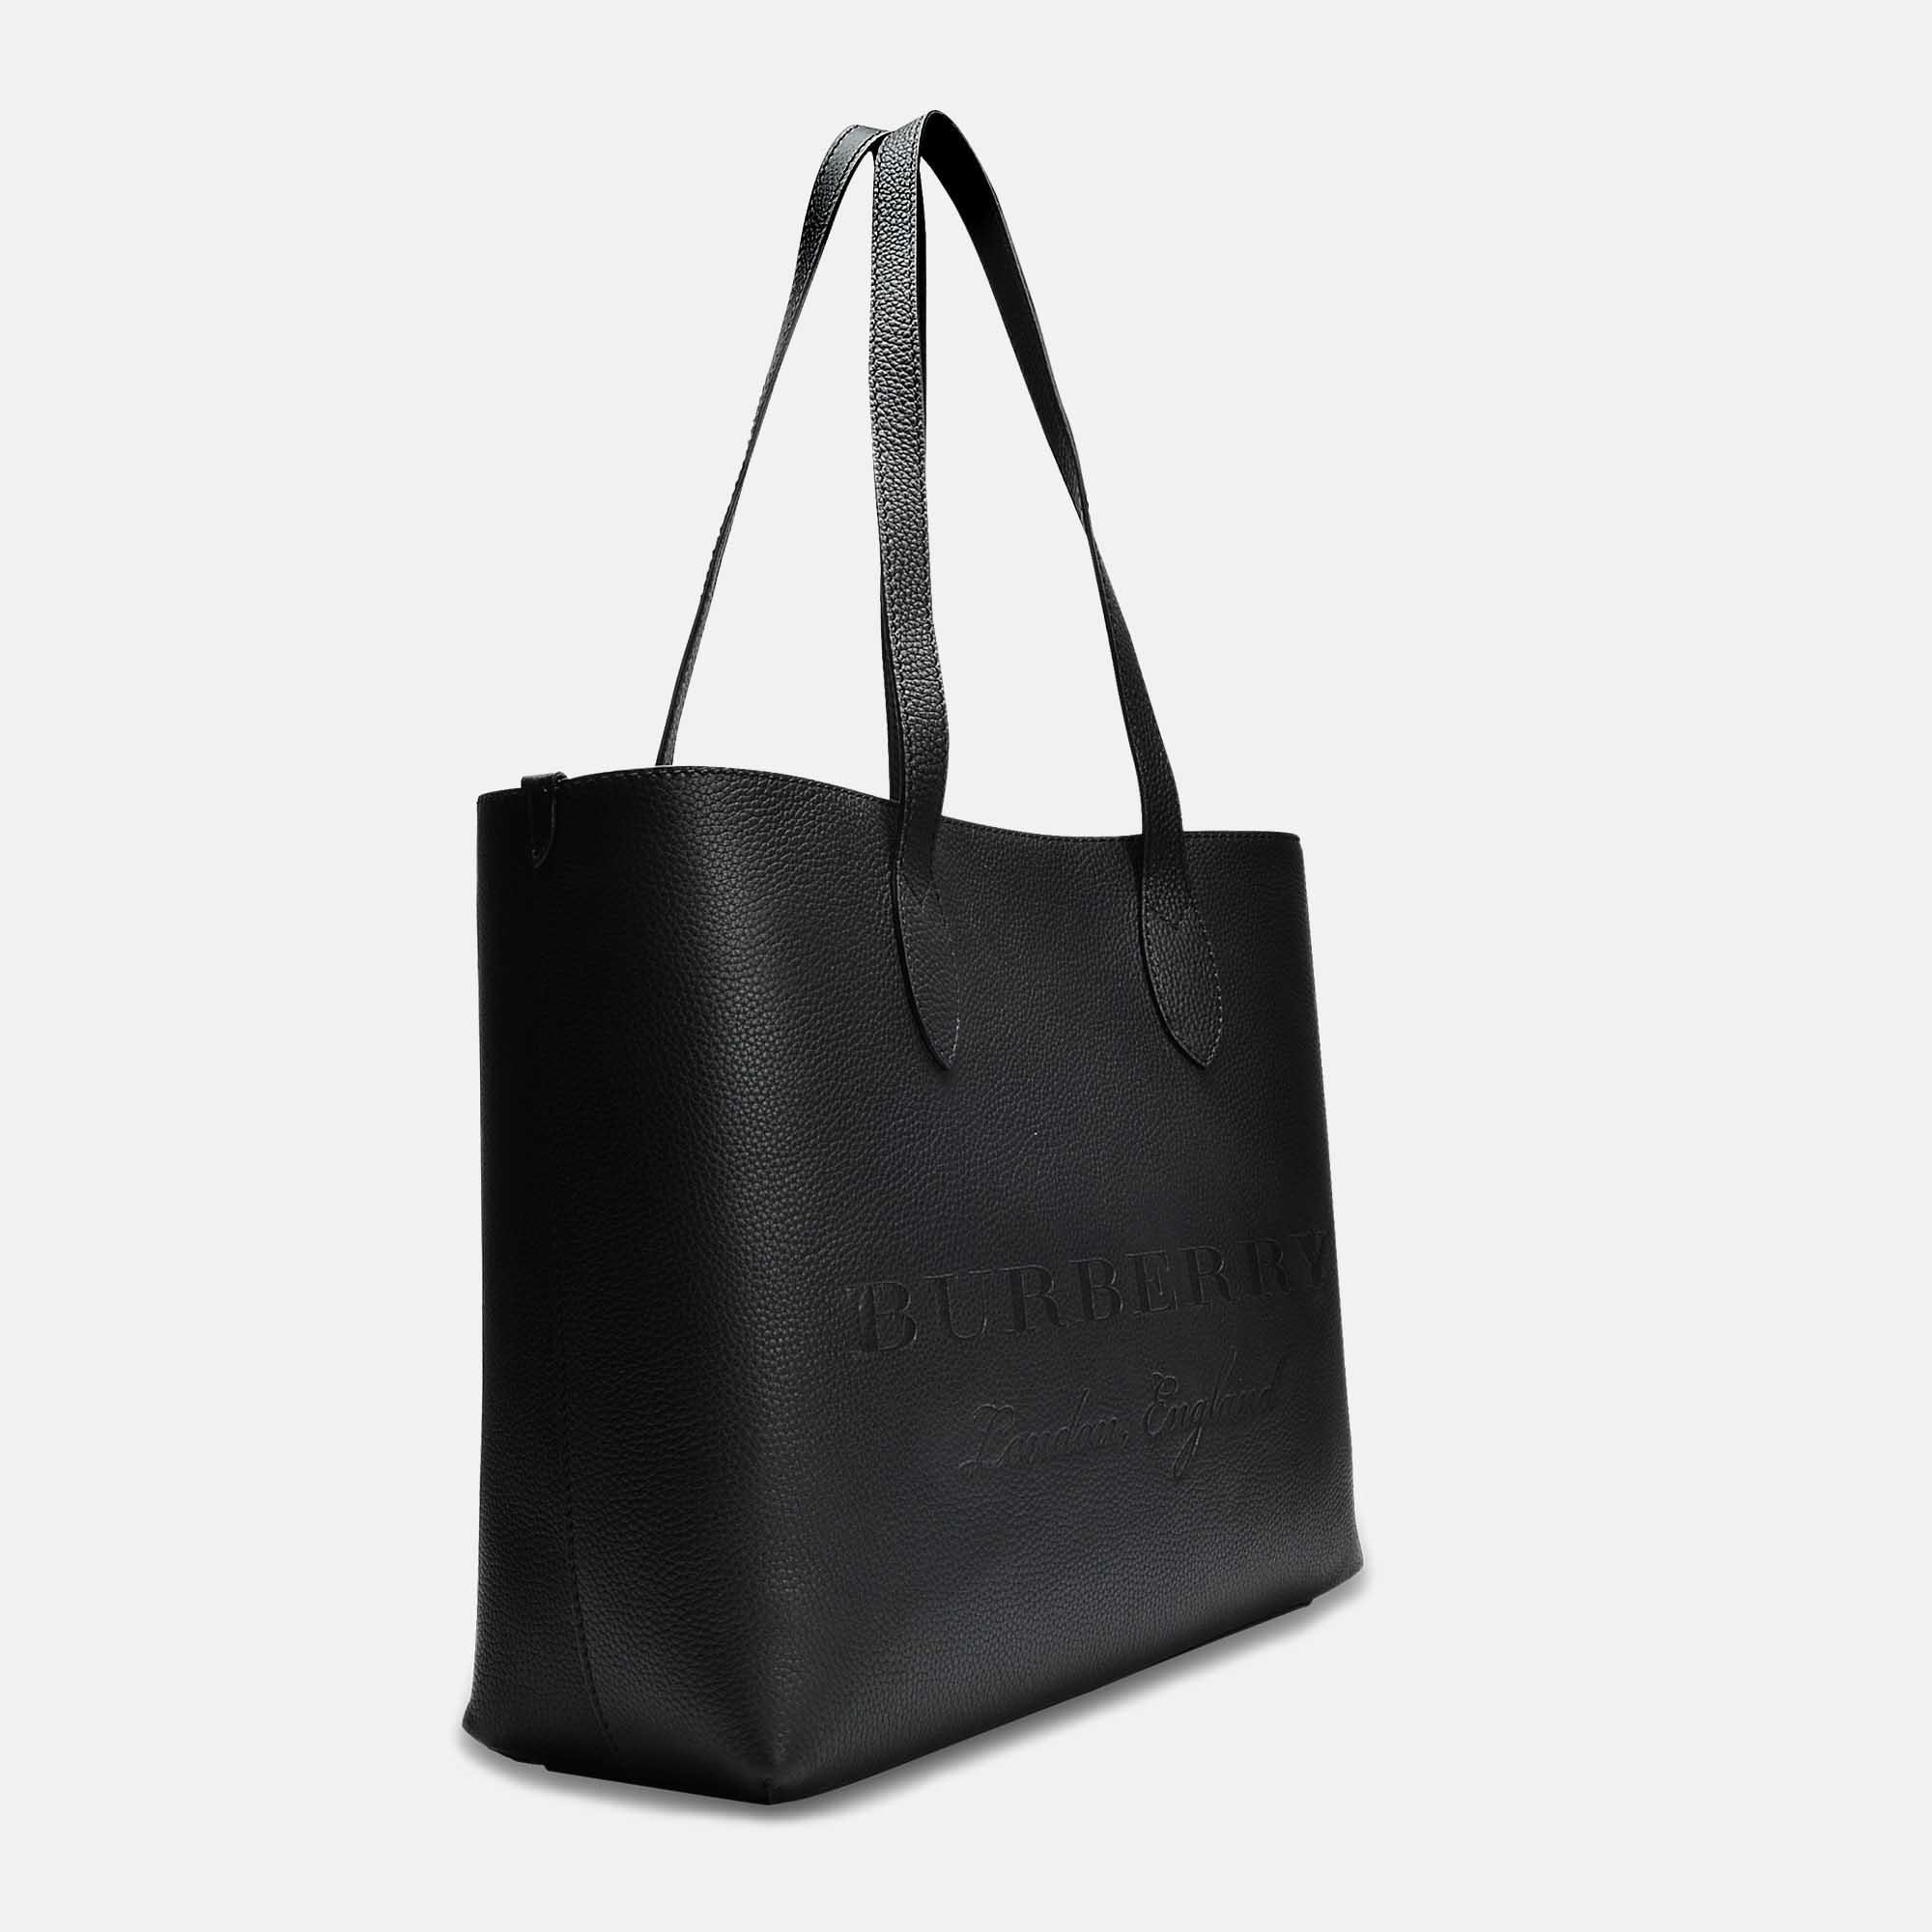 Burberry Large Remington Tote Bag In Black Grained Calfskin in Black ... b10075cb544e9